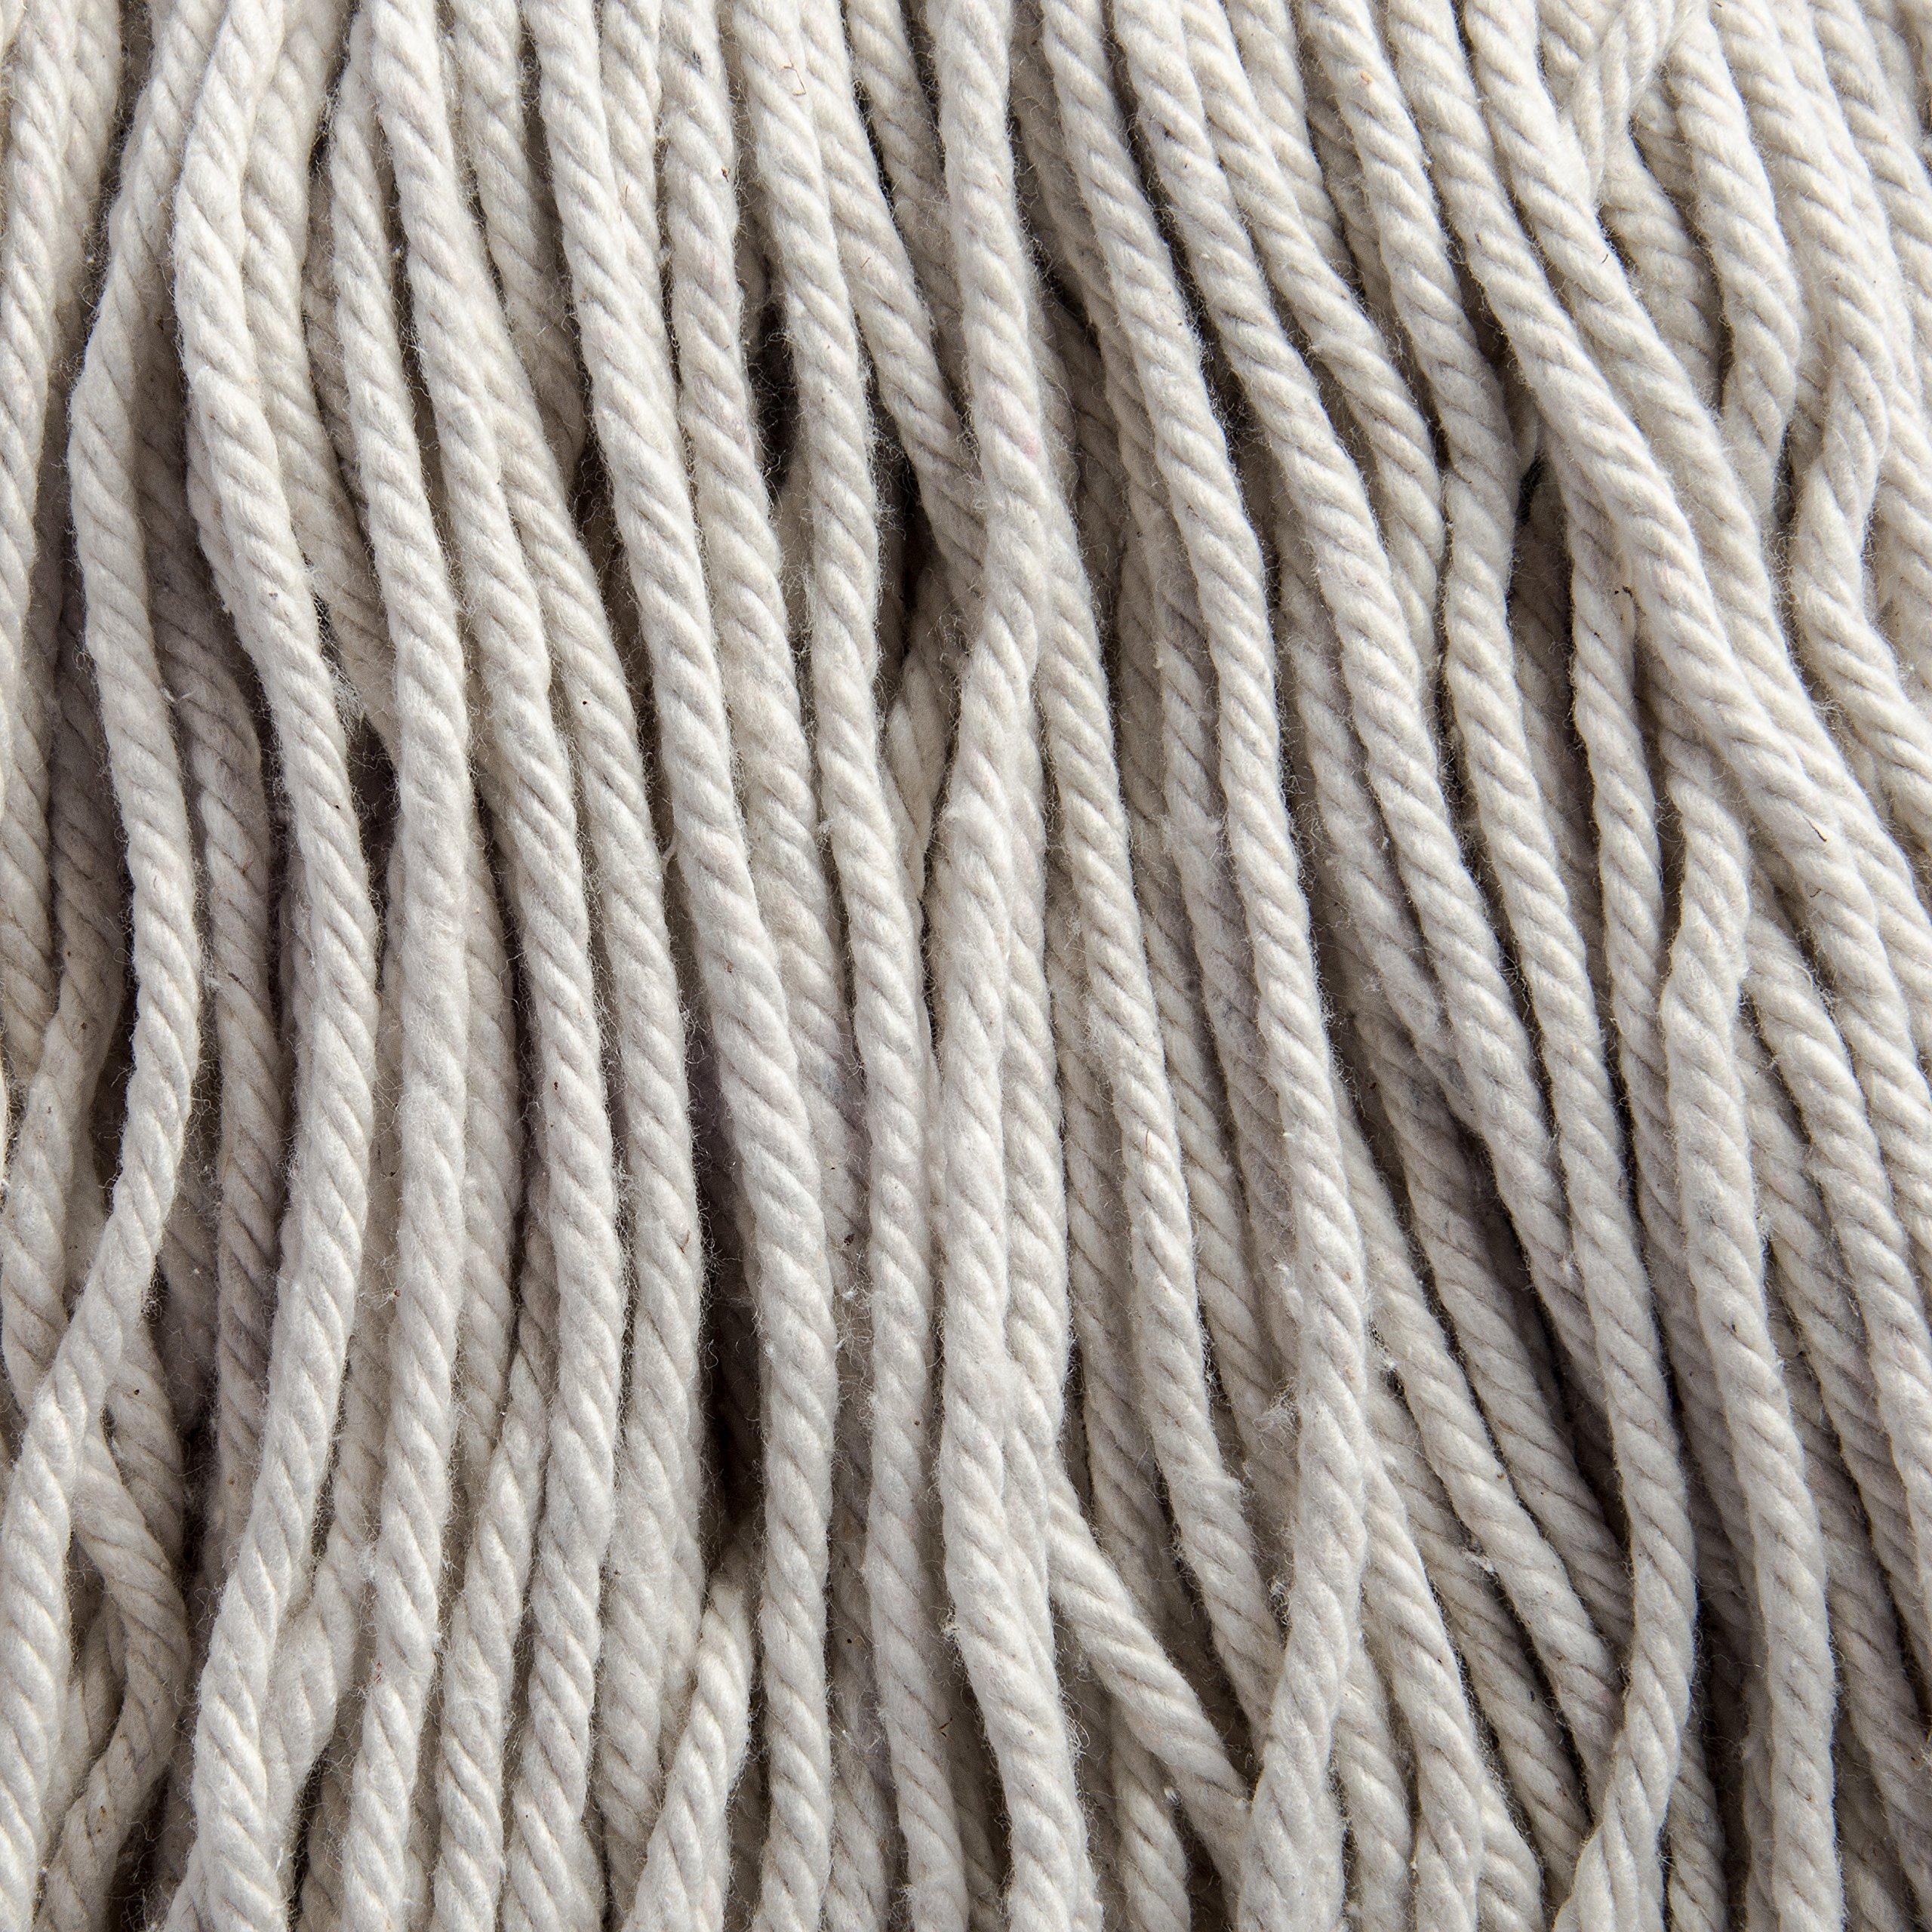 Carlisle 369024C00 Flo-Pac Kwik-On #24 Cotton Screw Top Cut-End Wet Mop, 18'' Length (Pack of 12) by Carlisle (Image #3)